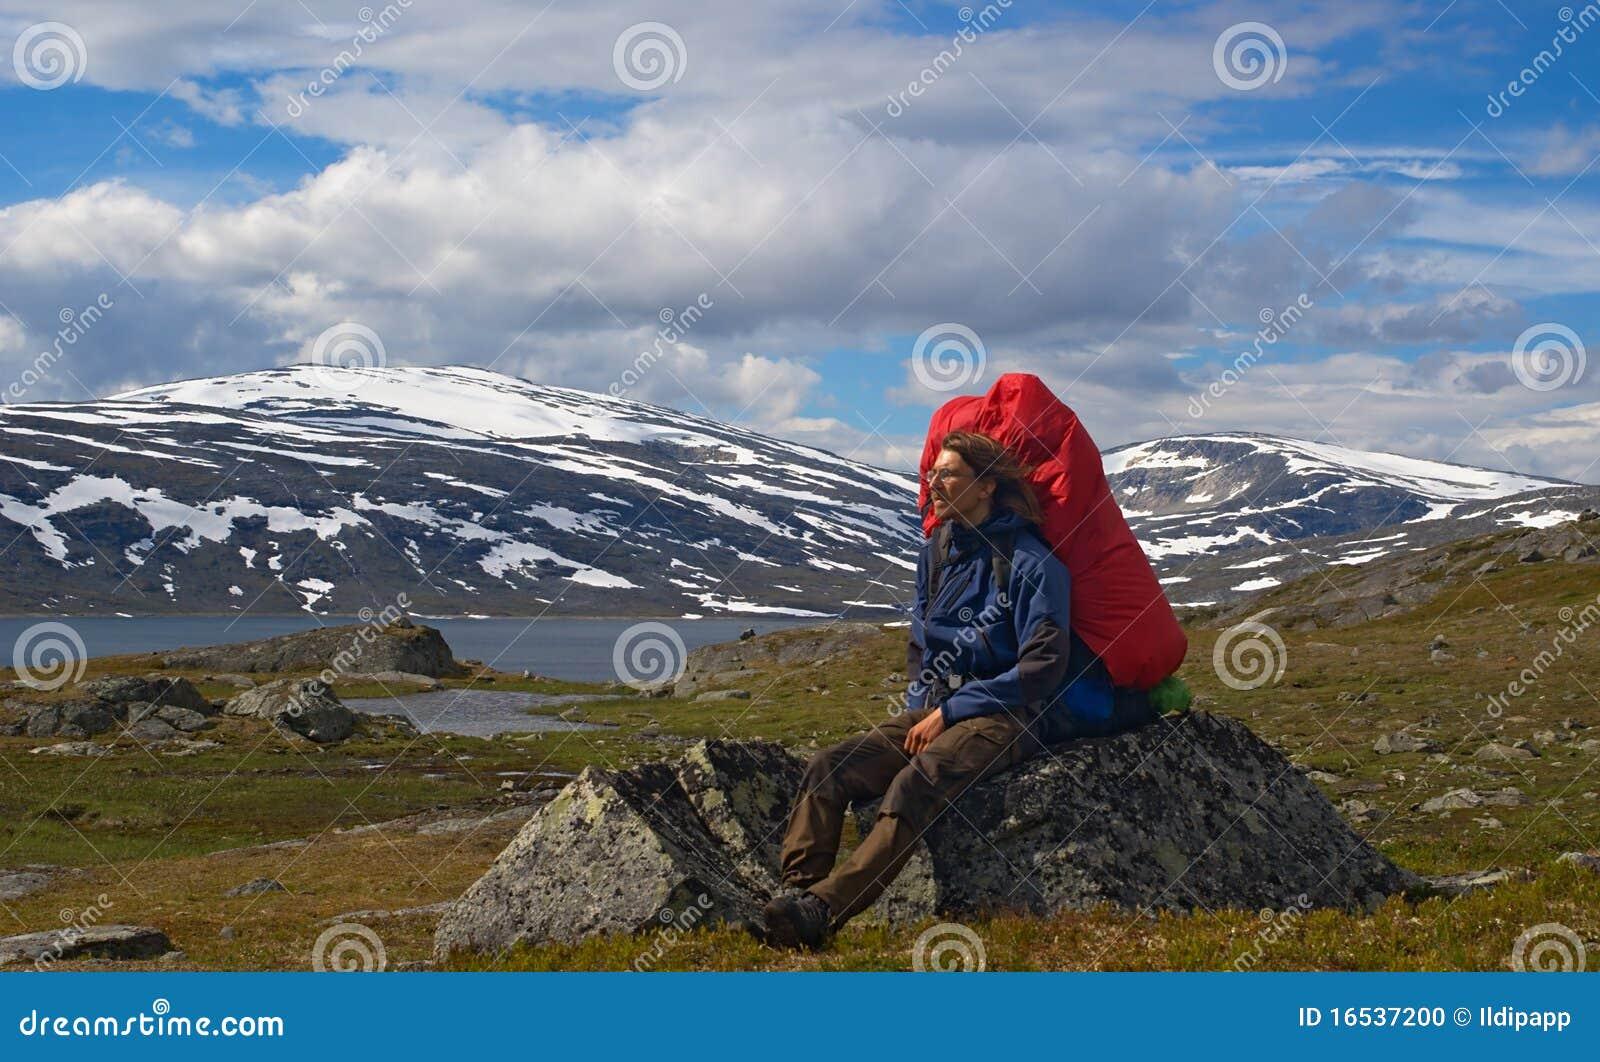 Hiker Resting on Rock